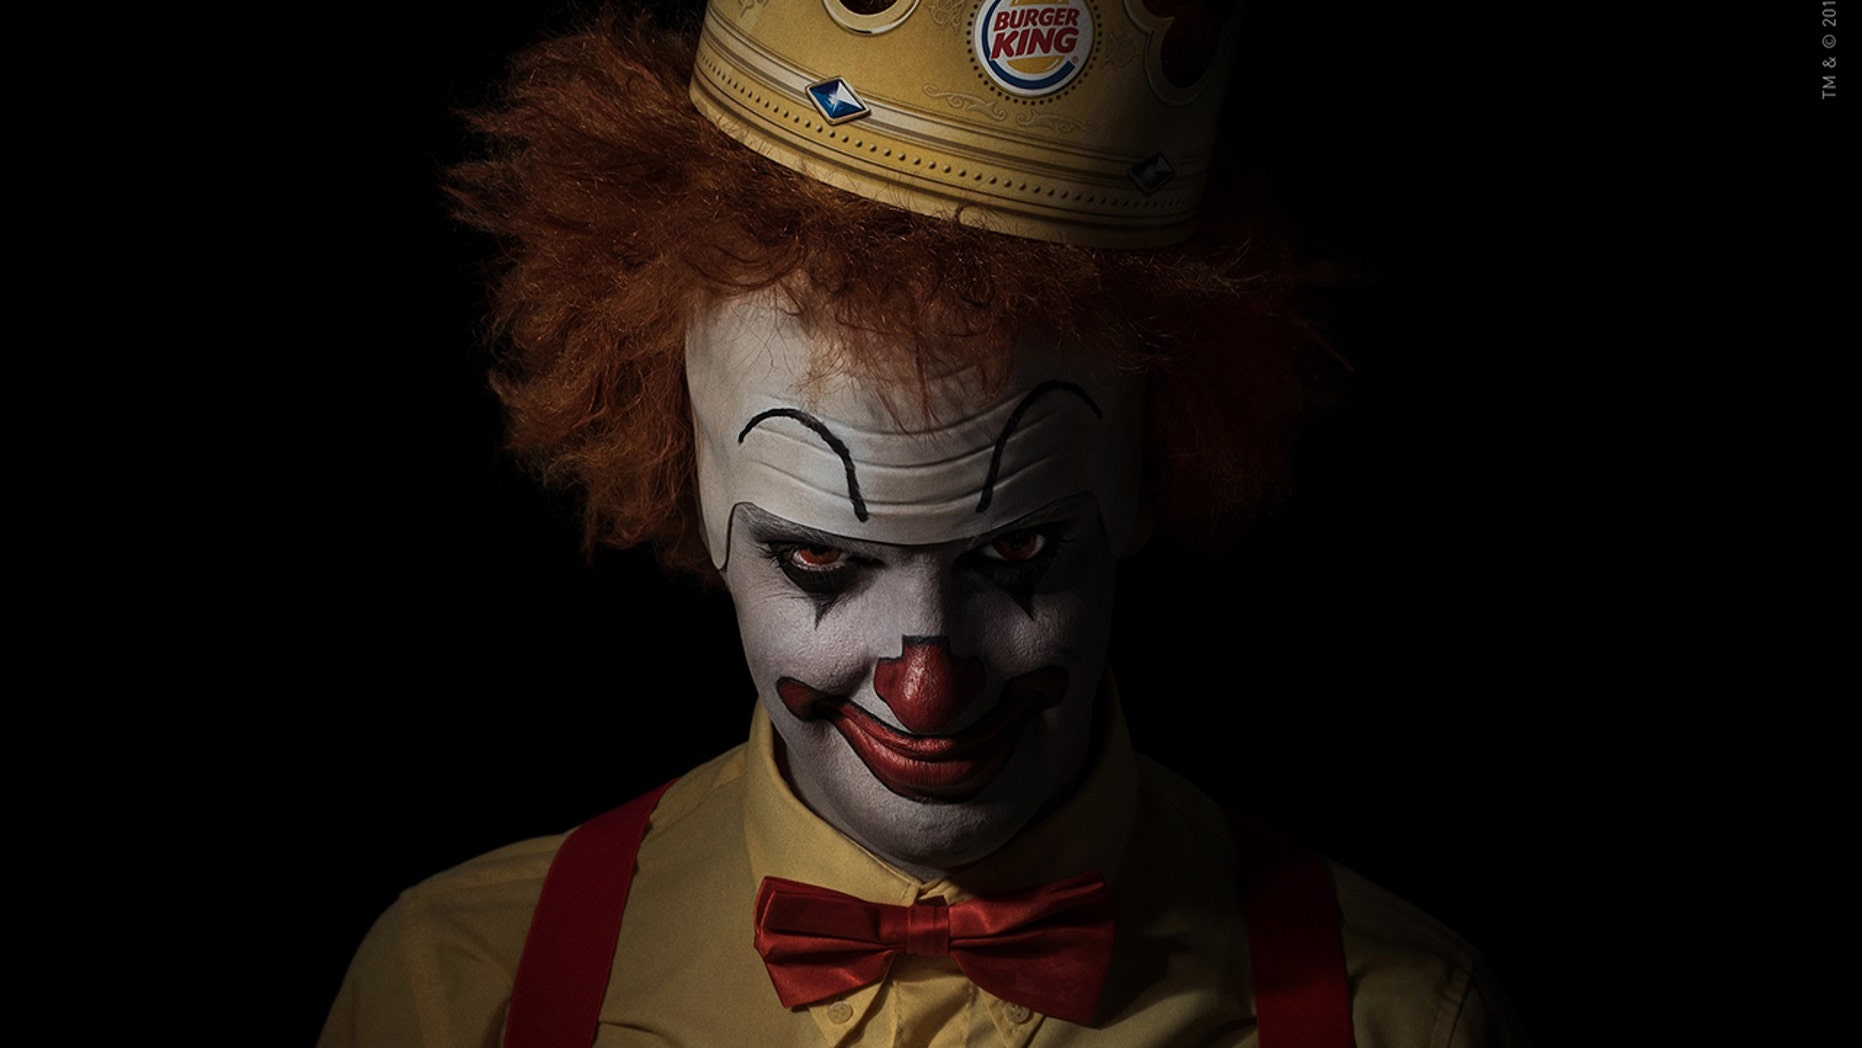 burger king takes jab at mcdonald's with 'scary clown night' | fox news